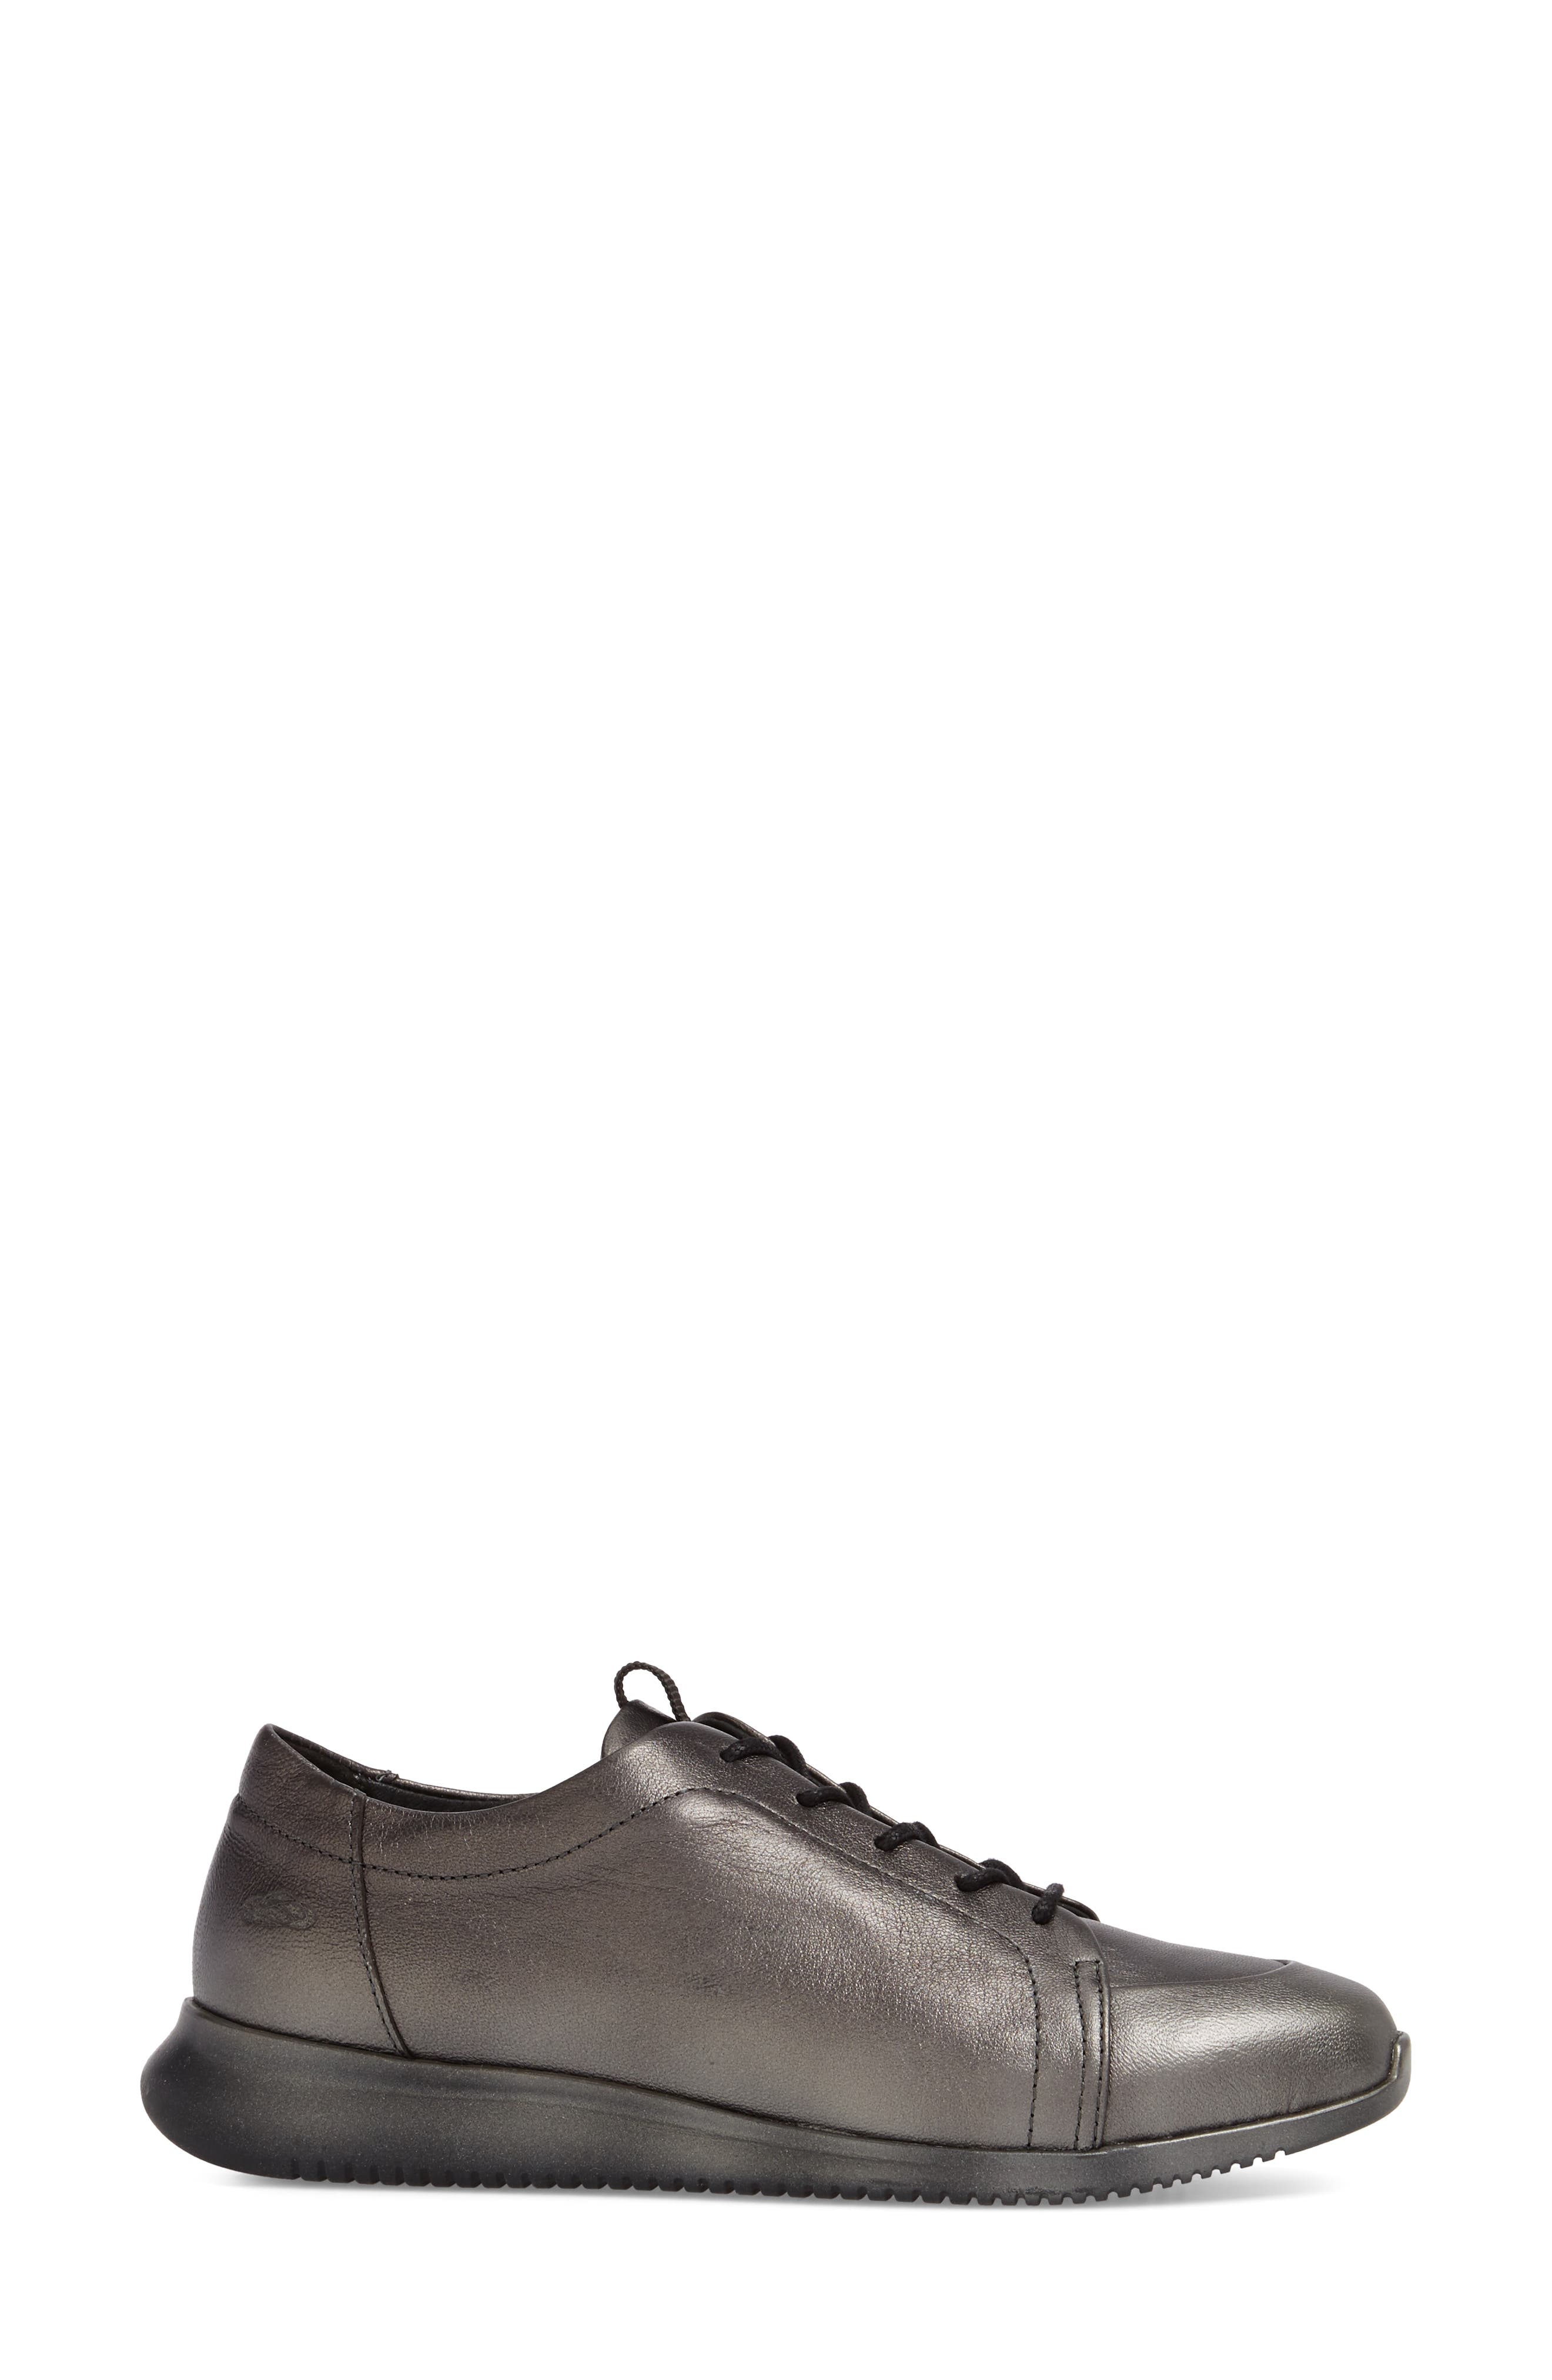 Ria Sneaker,                             Alternate thumbnail 3, color,